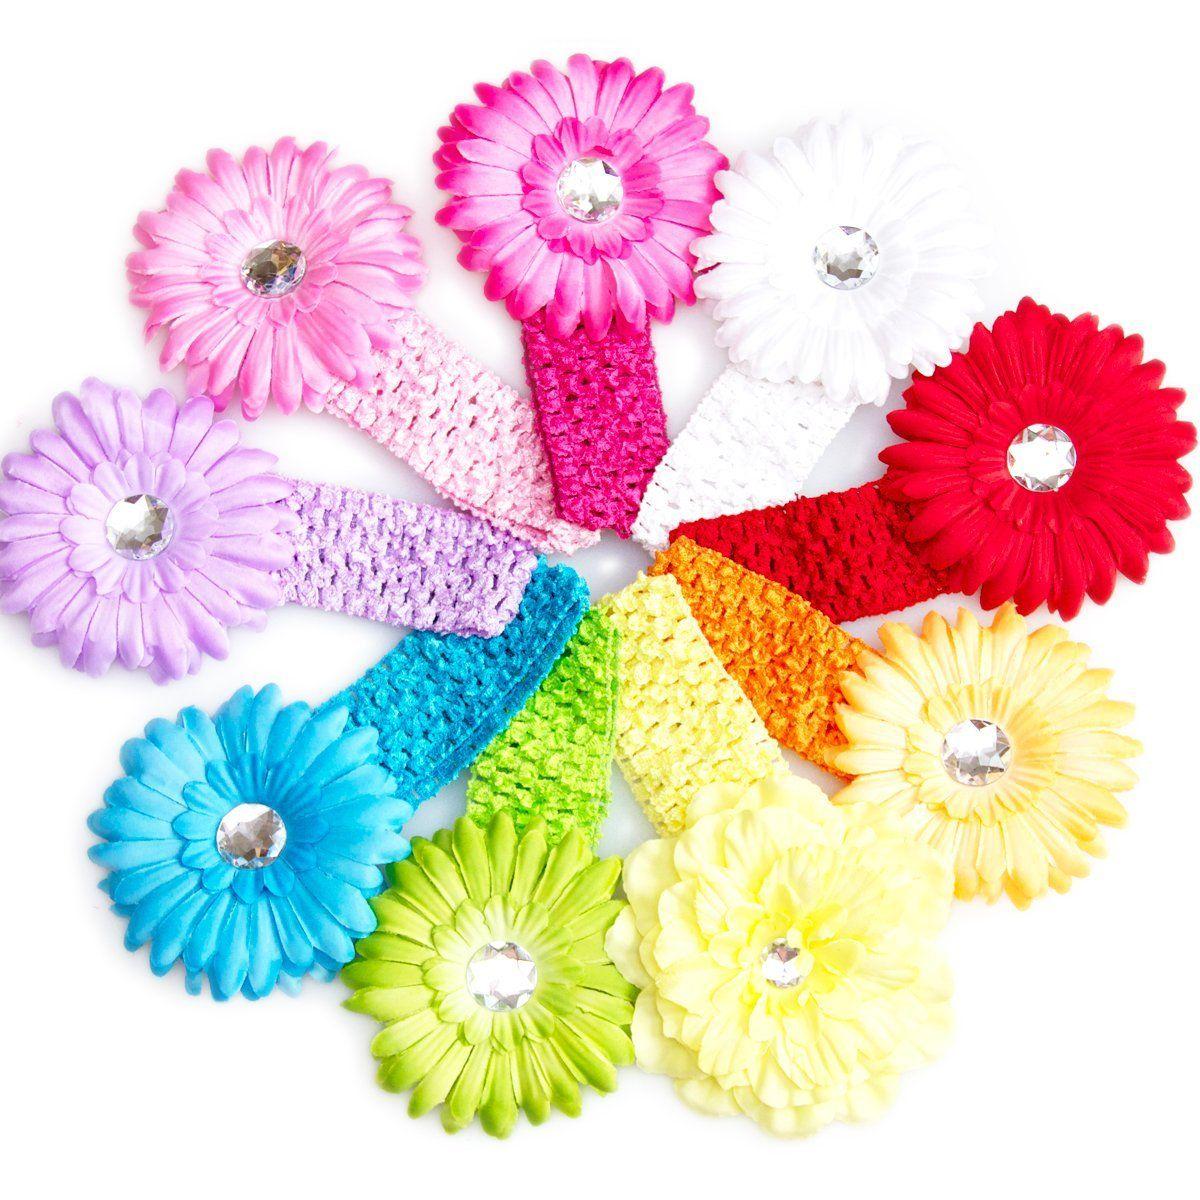 Ema Jane 8 Spring Bling Gerber Daisy Flower Hair Clips With Soft